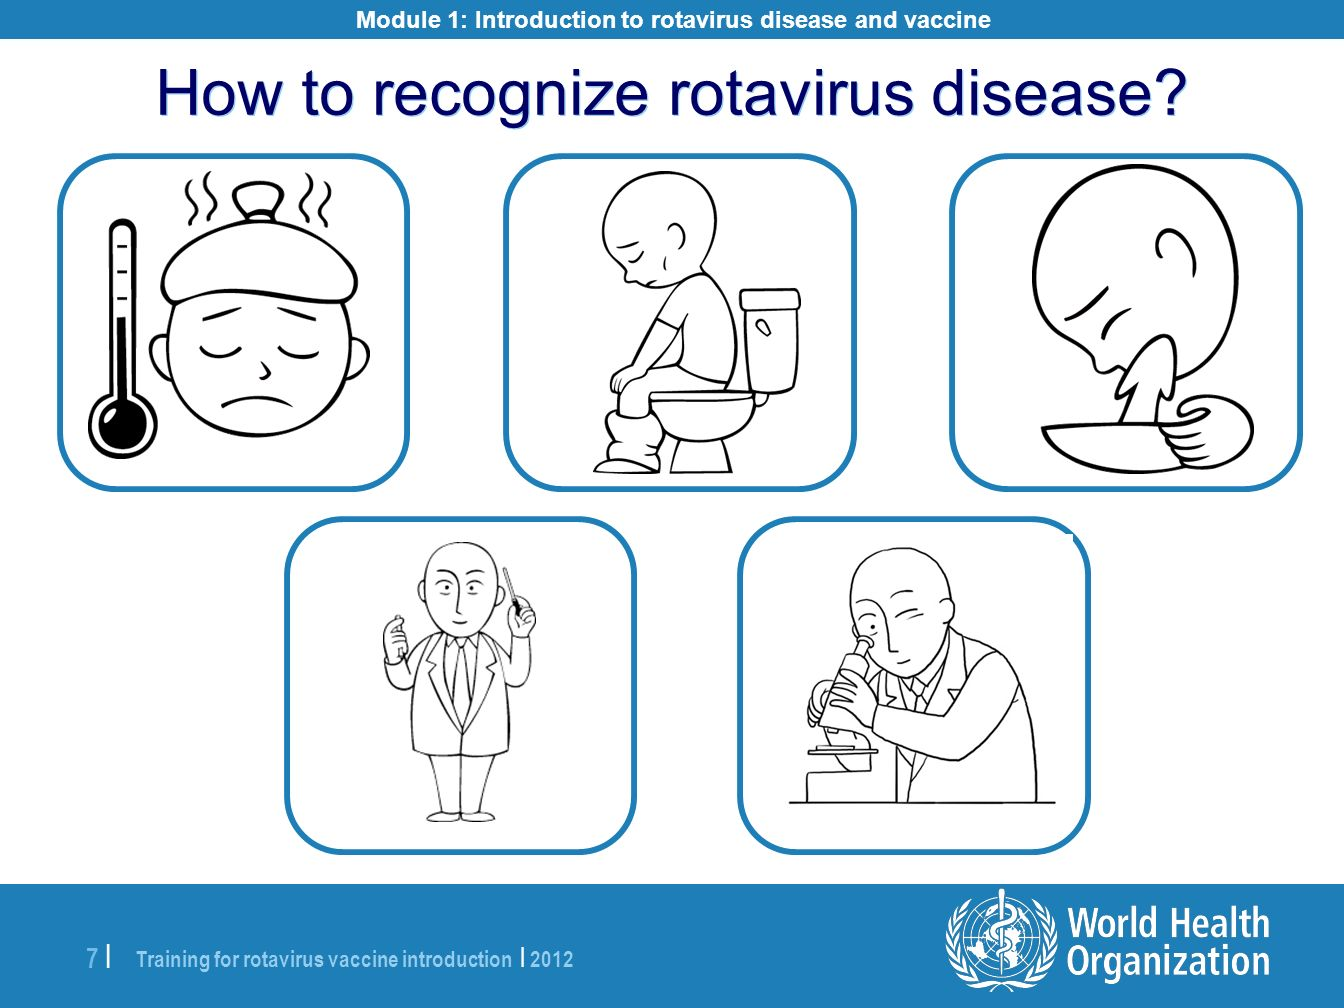 How to recognize rotavirus disease